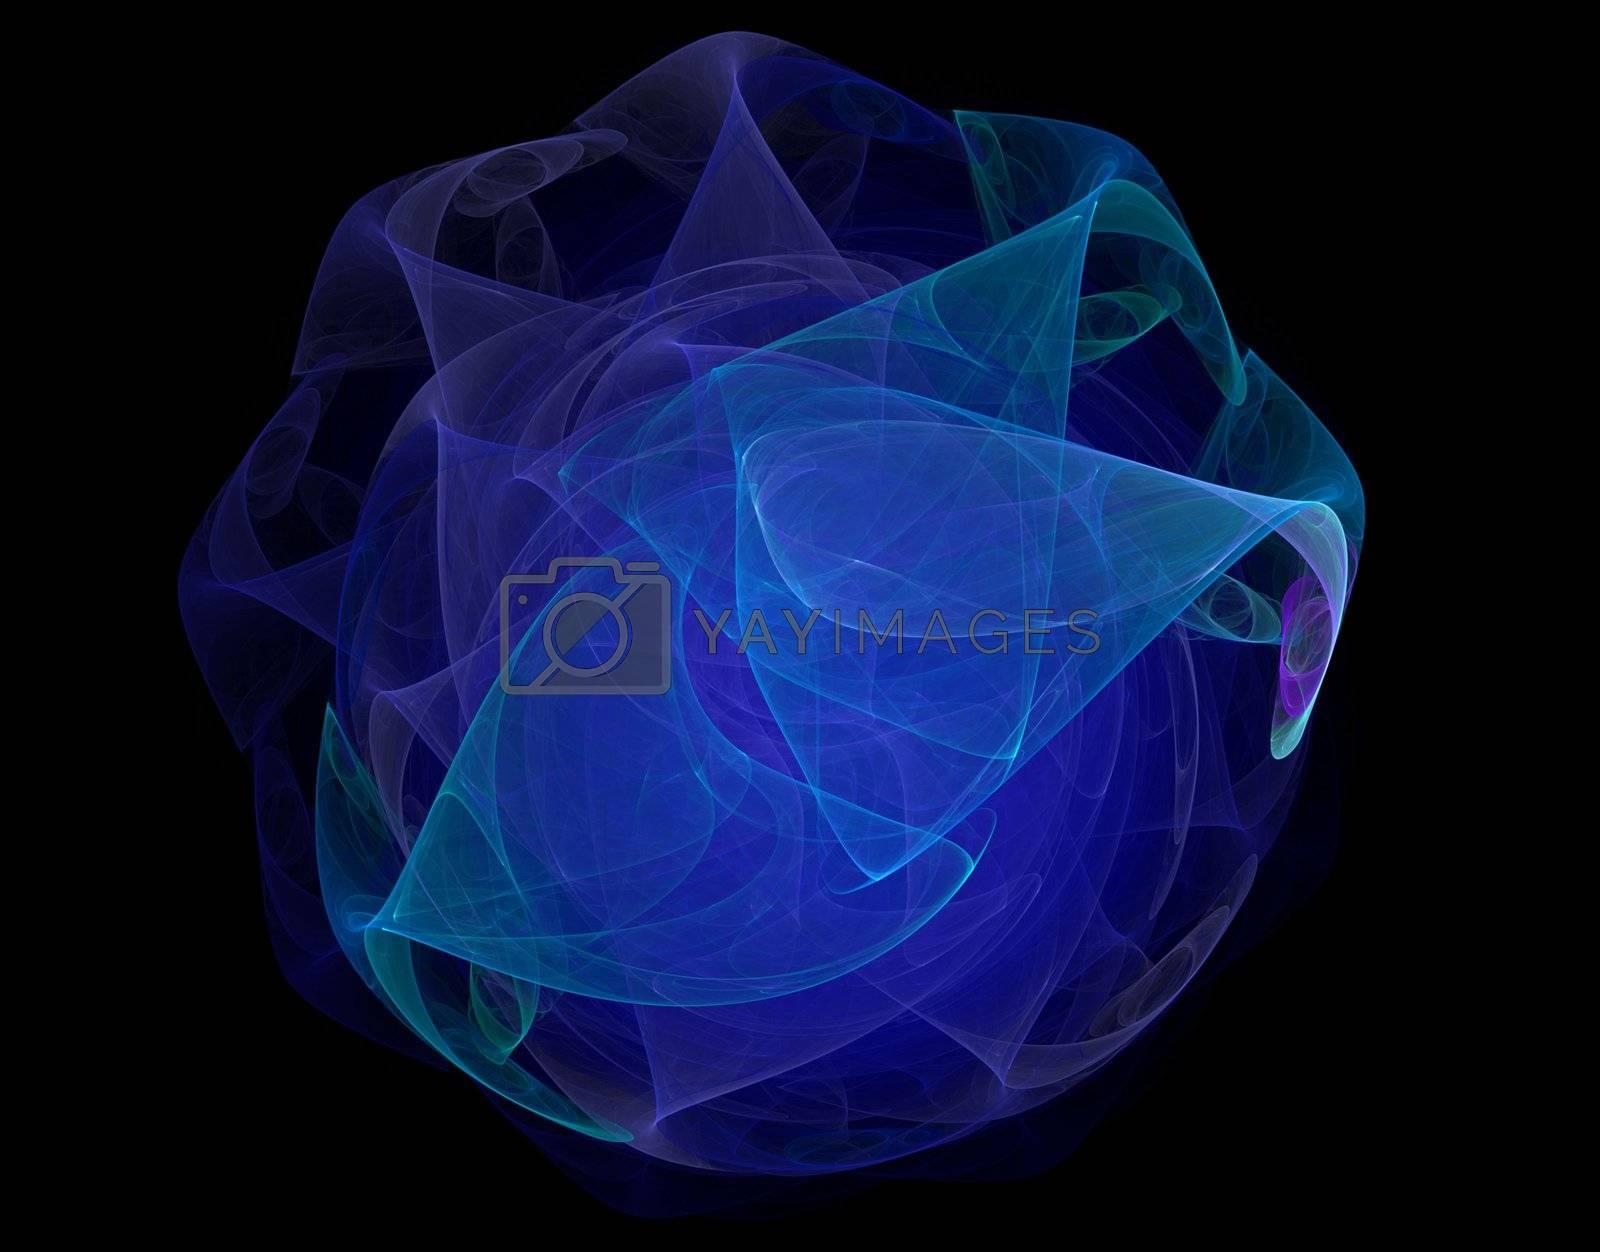 Blue rose - sphere like fractal graphics